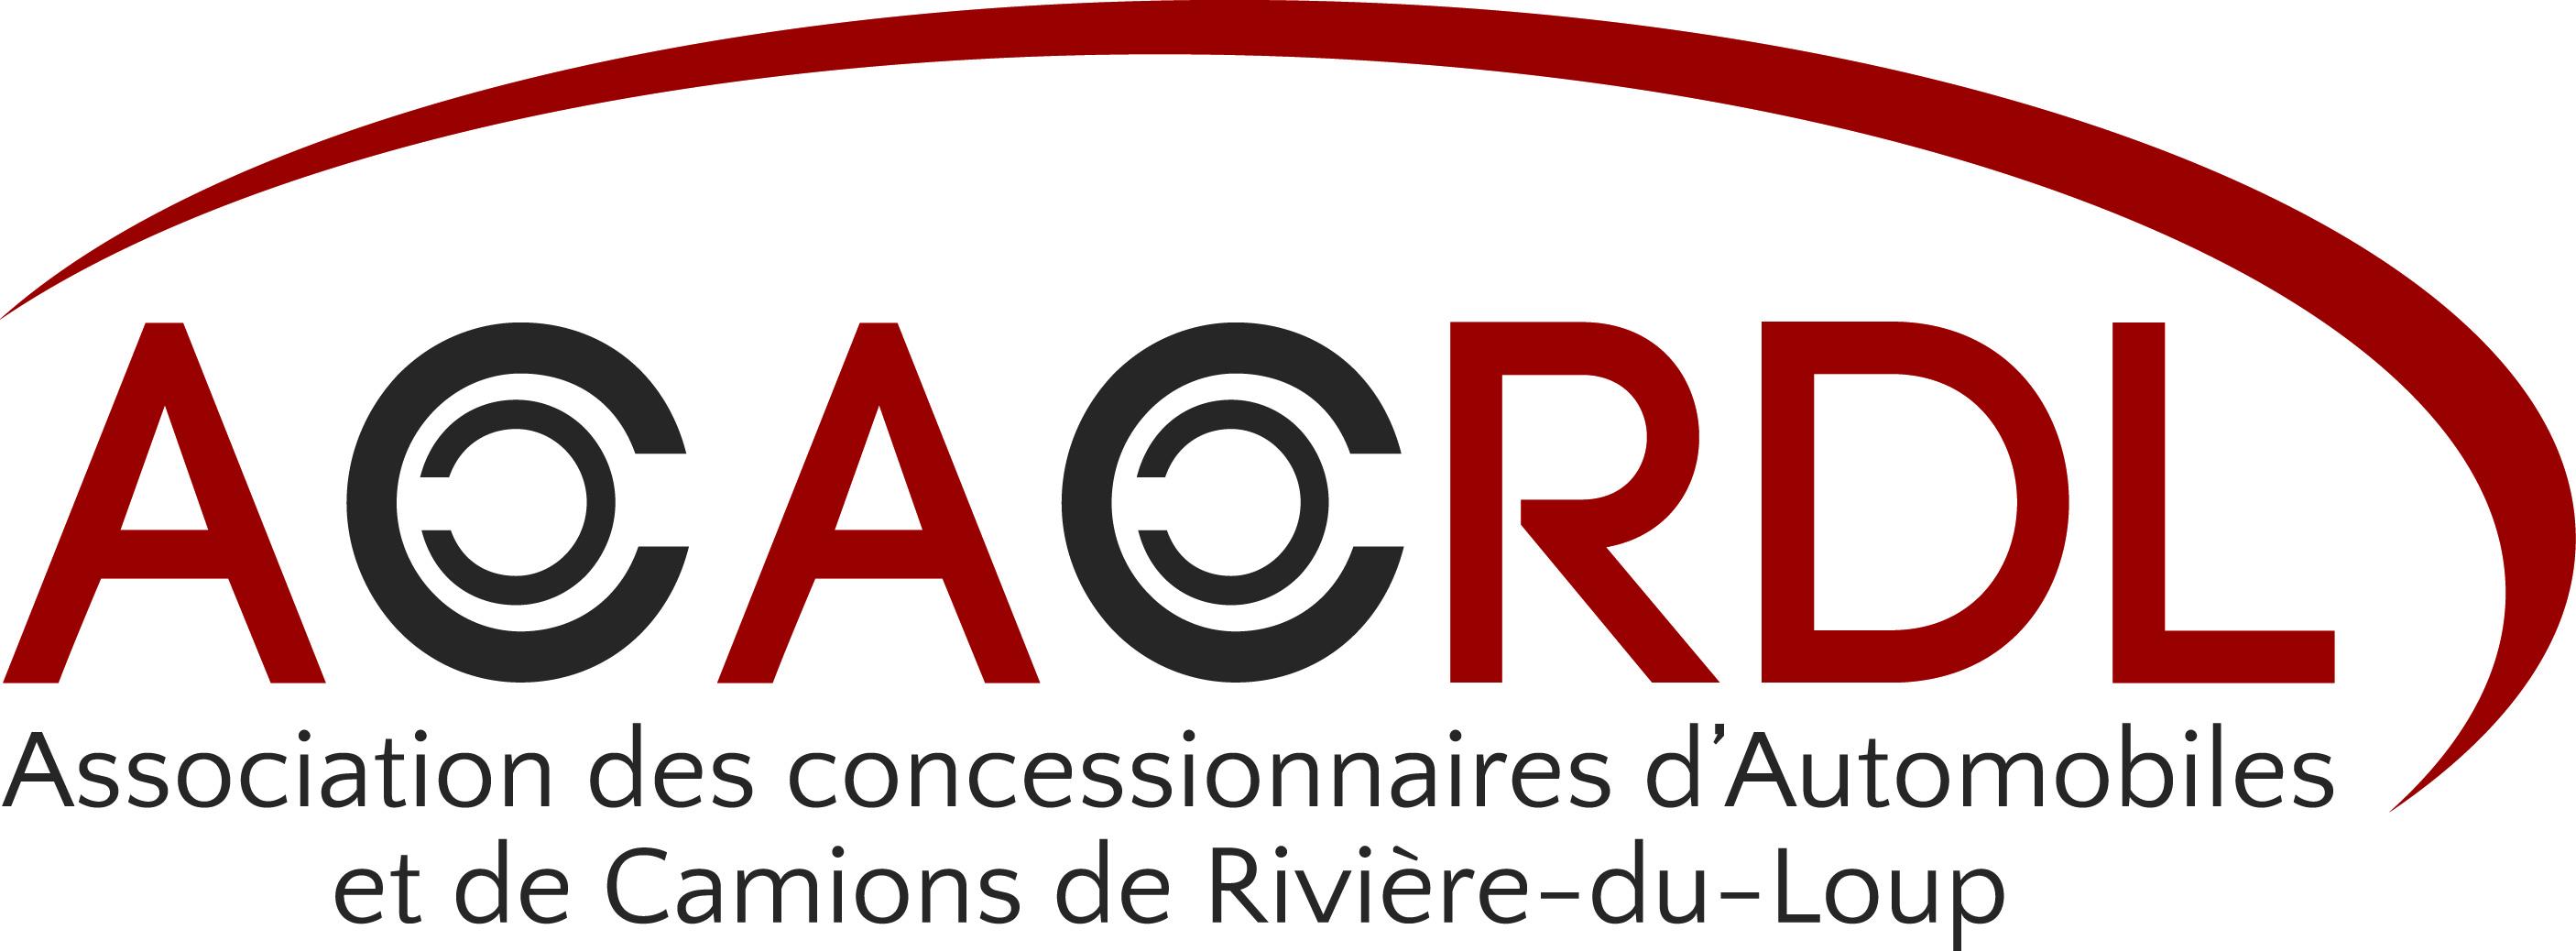 Logo_ACACRDL.jpg (1.06 MB)